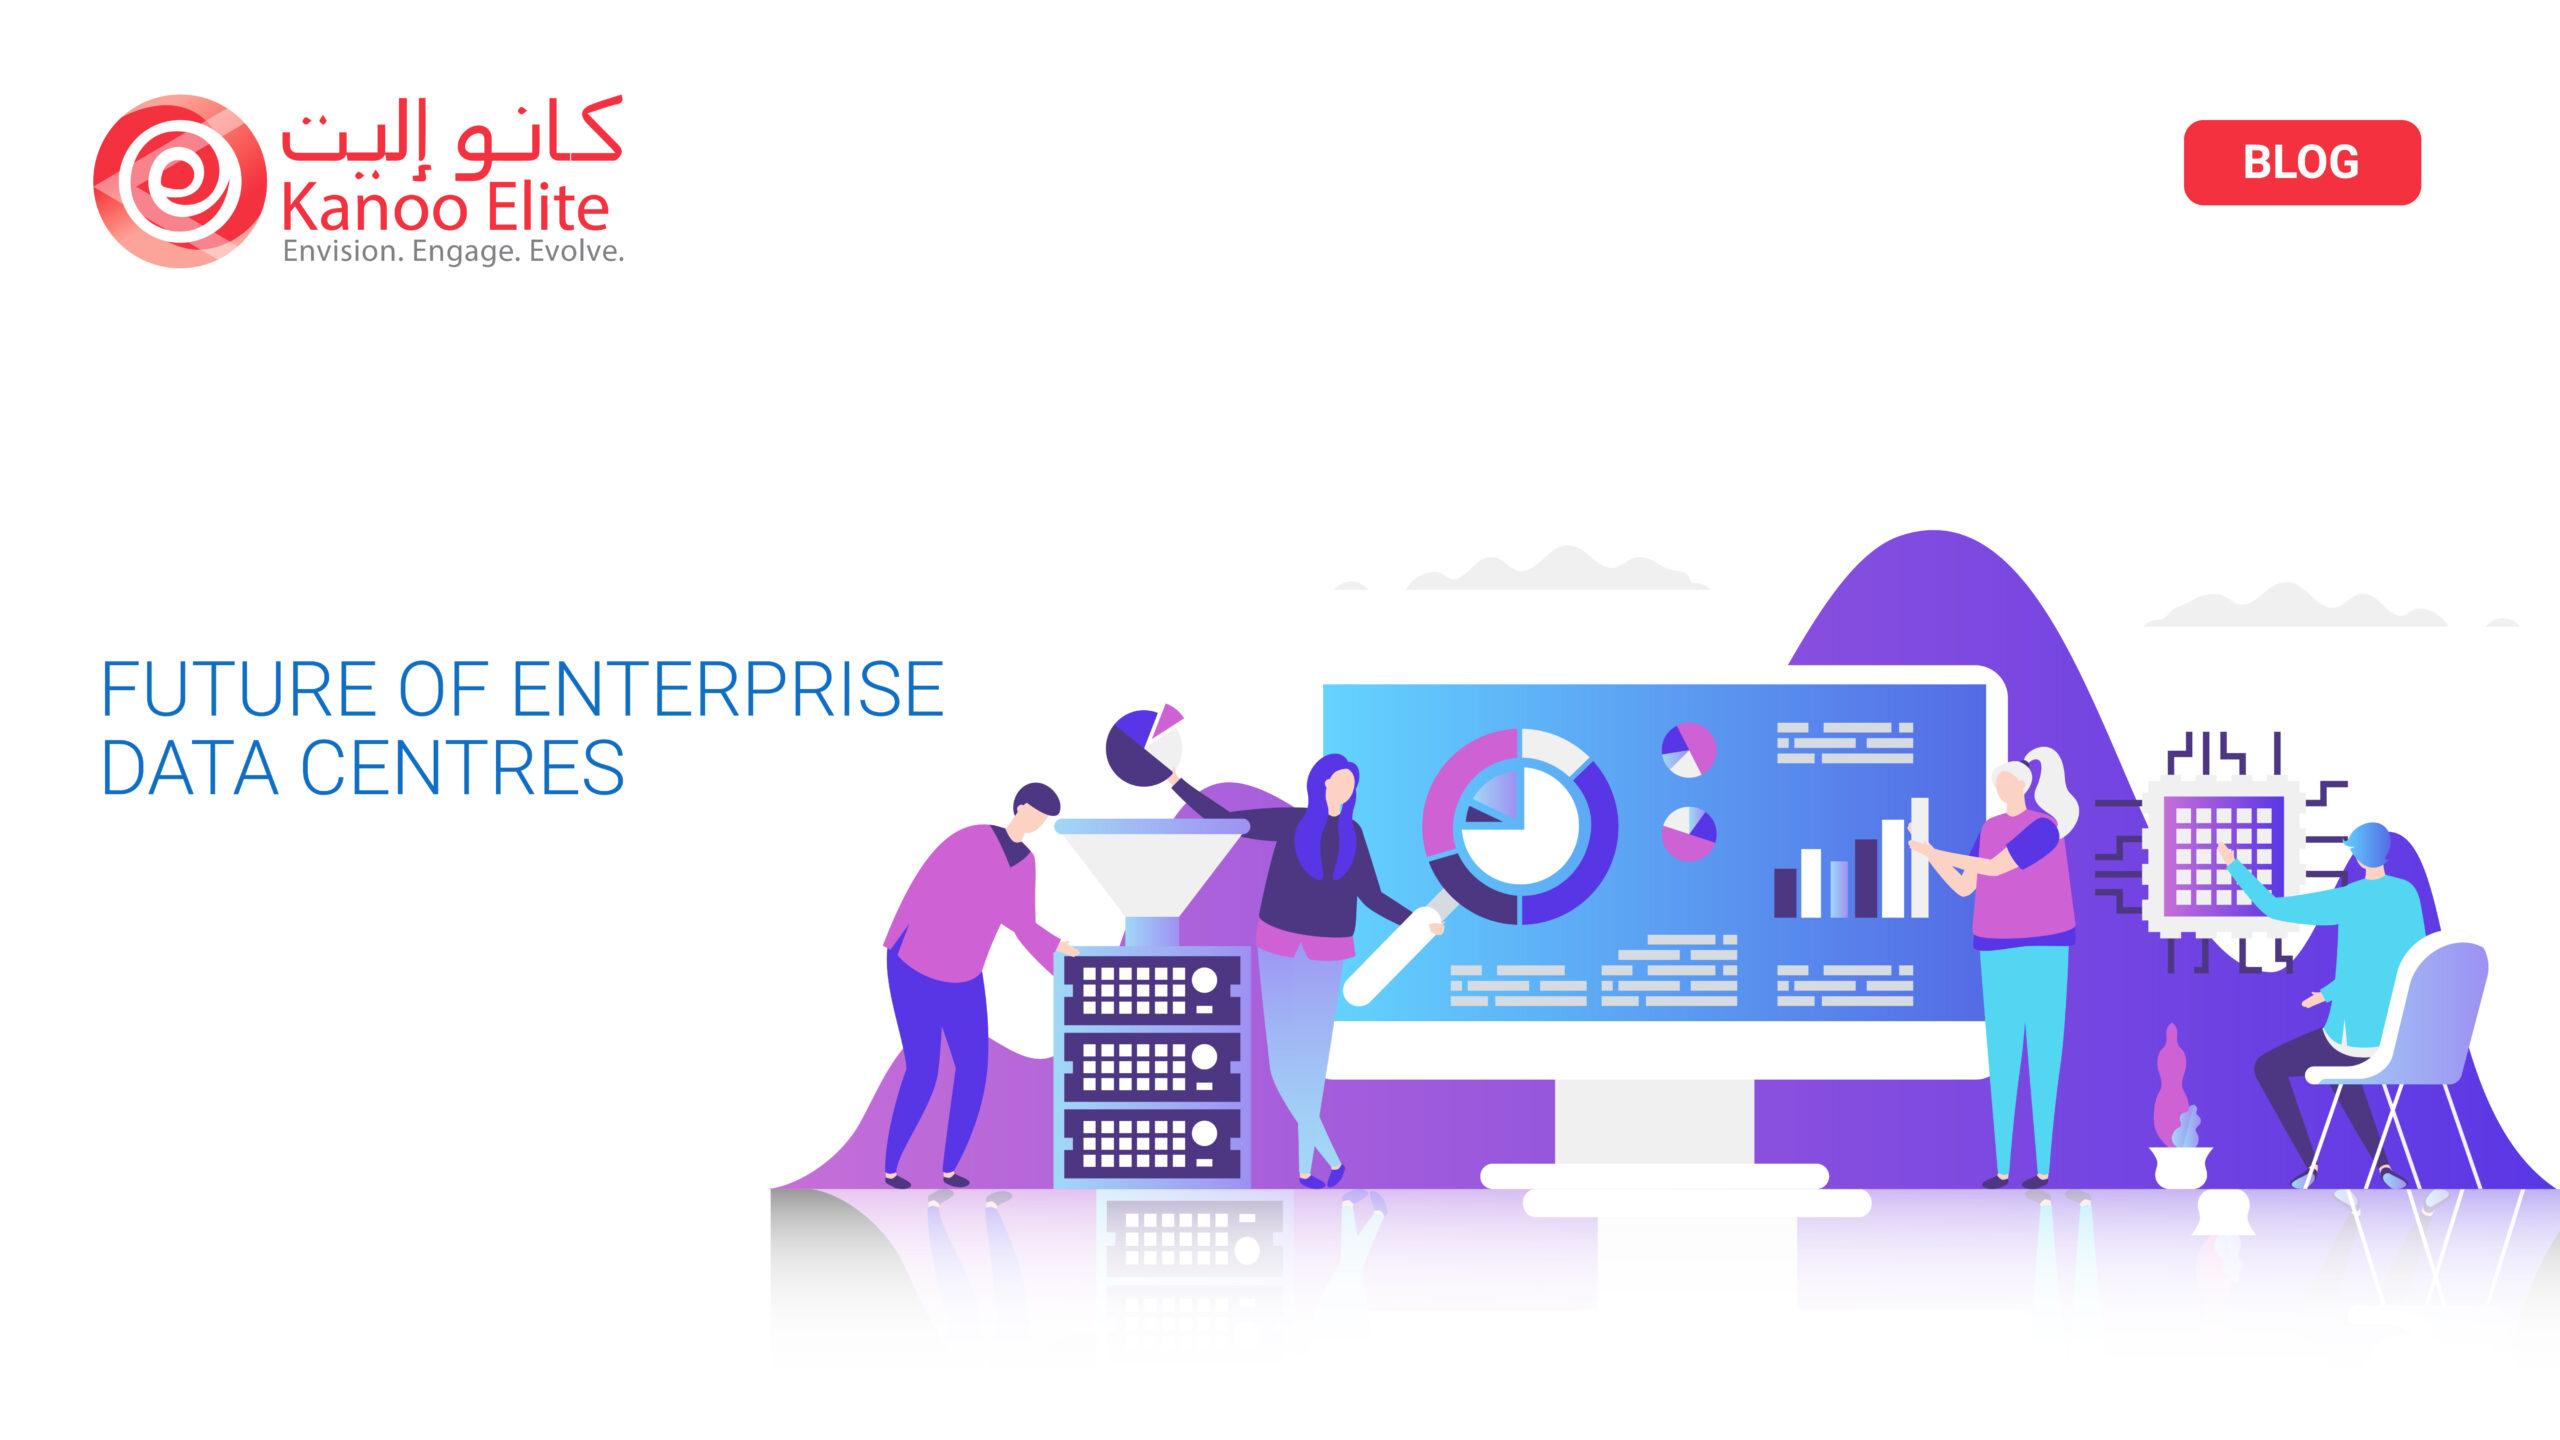 Future of Enterprise Data Centres